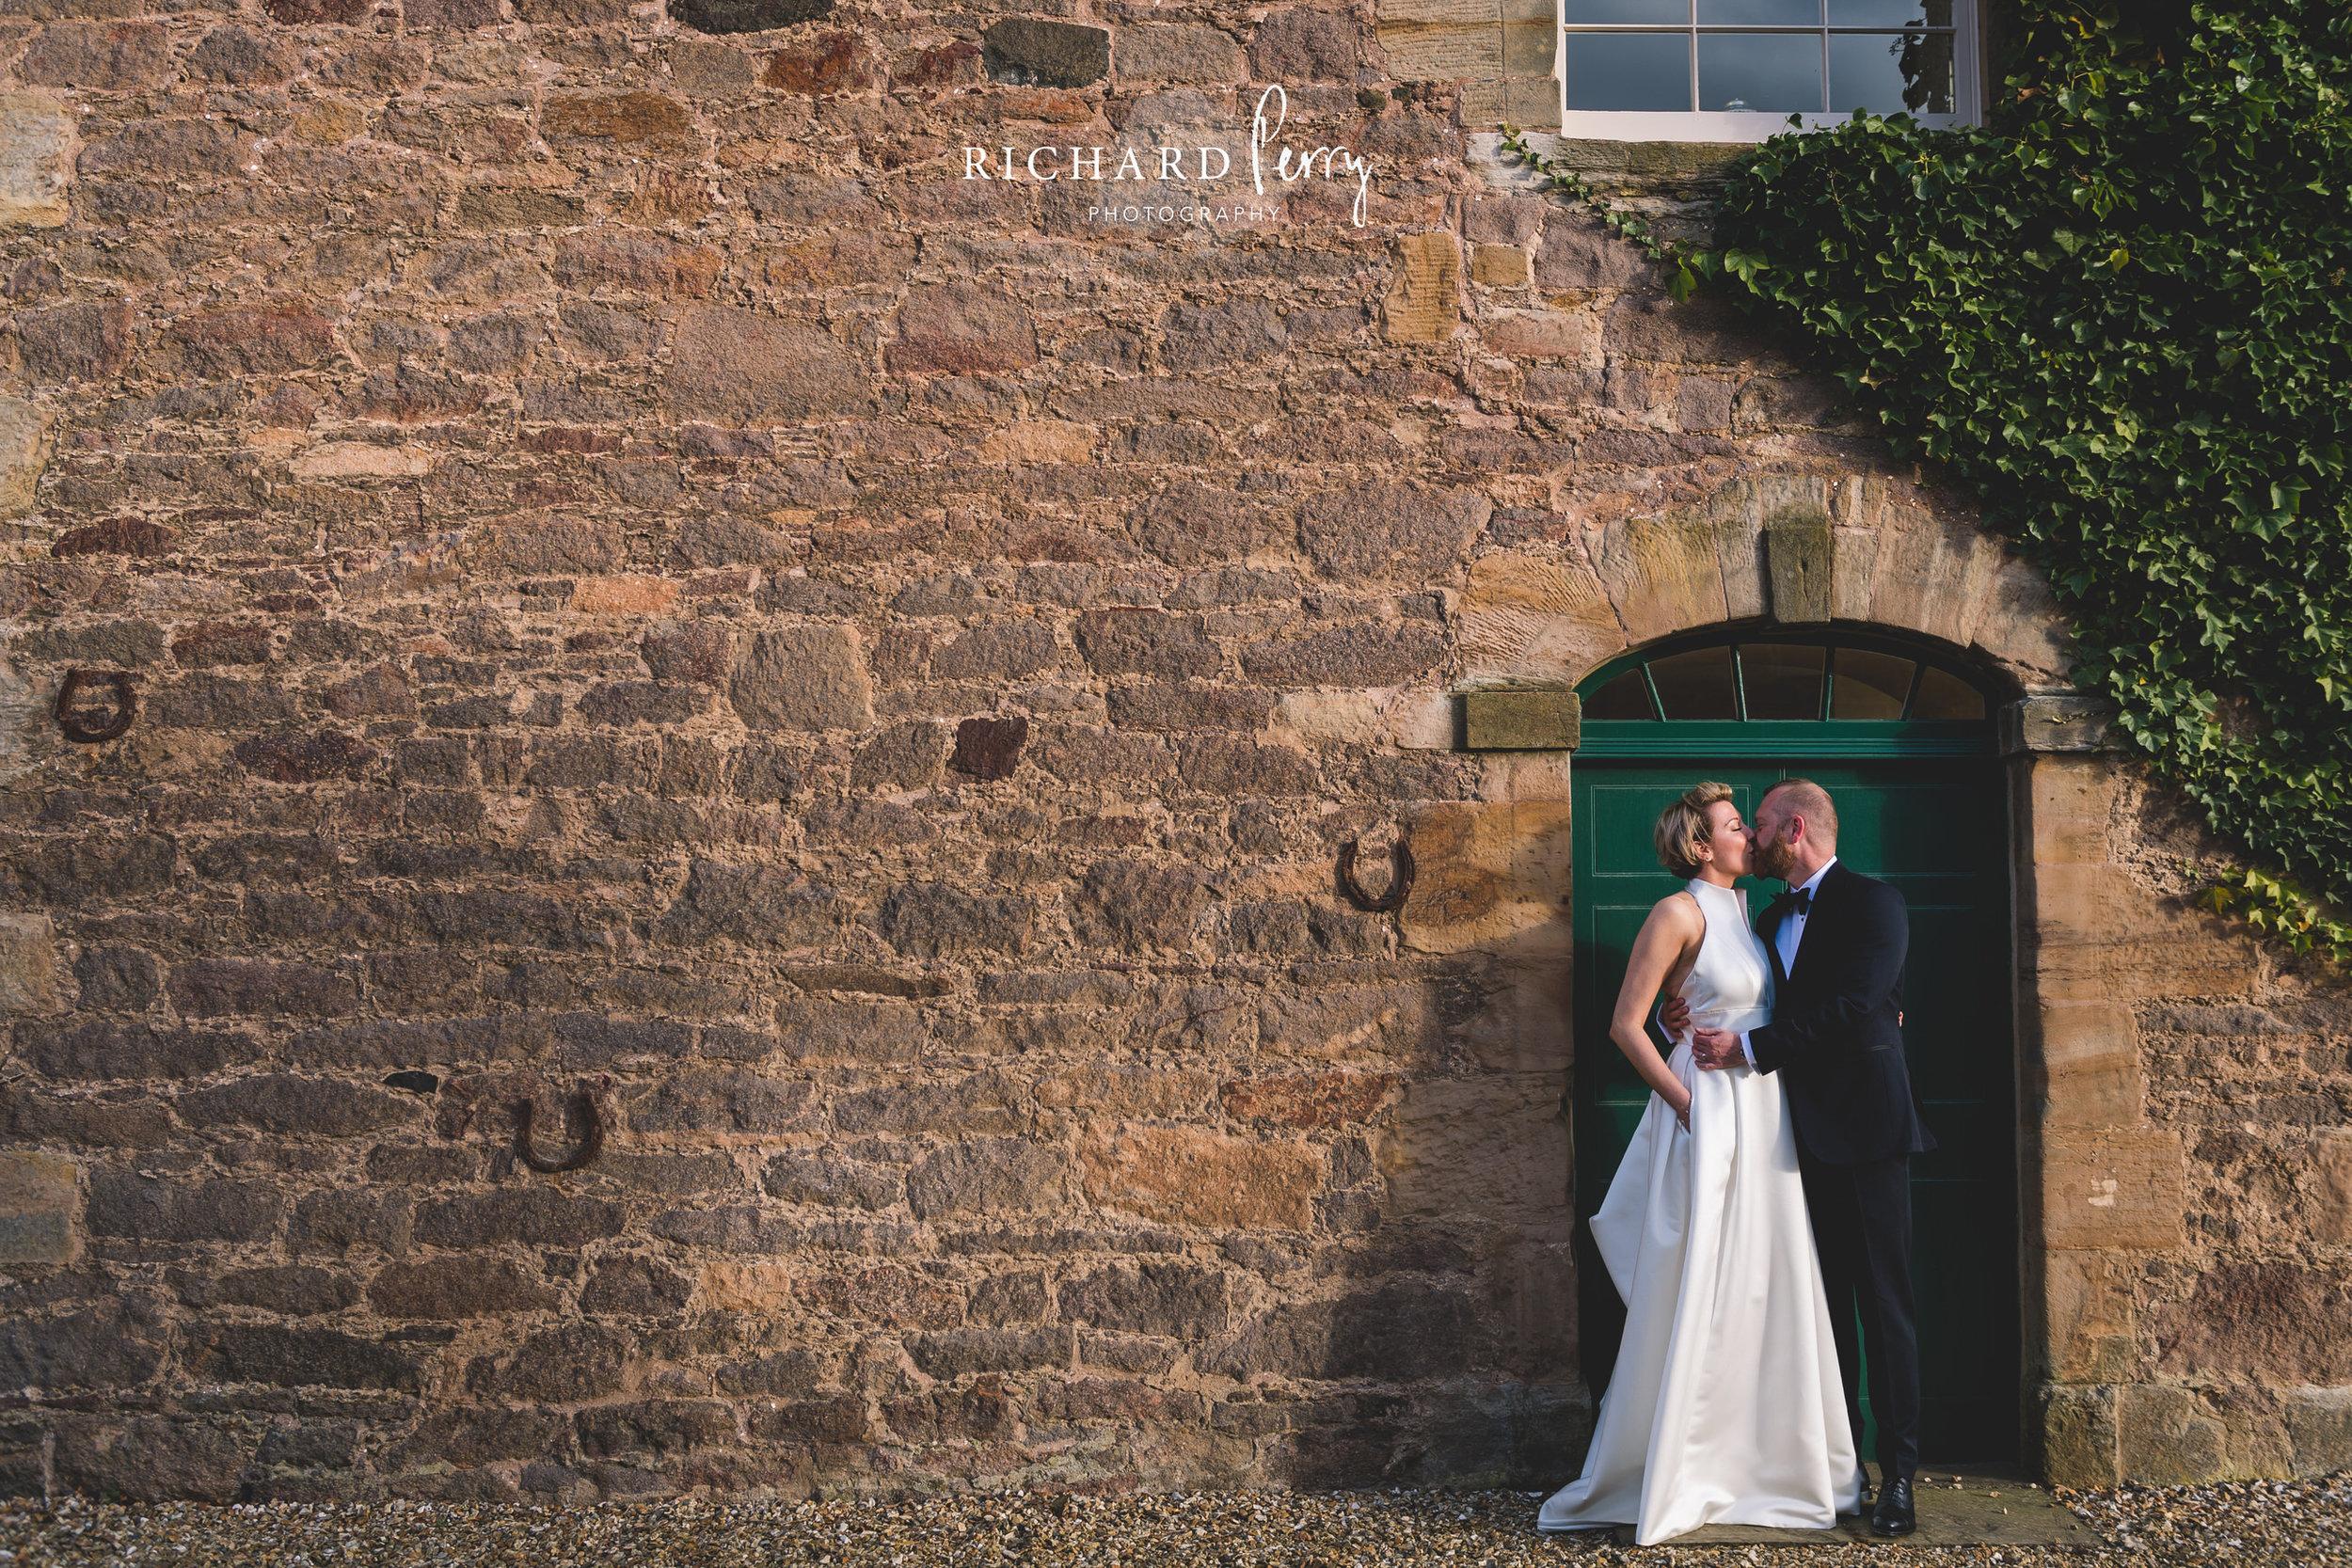 yorkshire-wedding-photographer-destination-archerfield-house-24.jpg